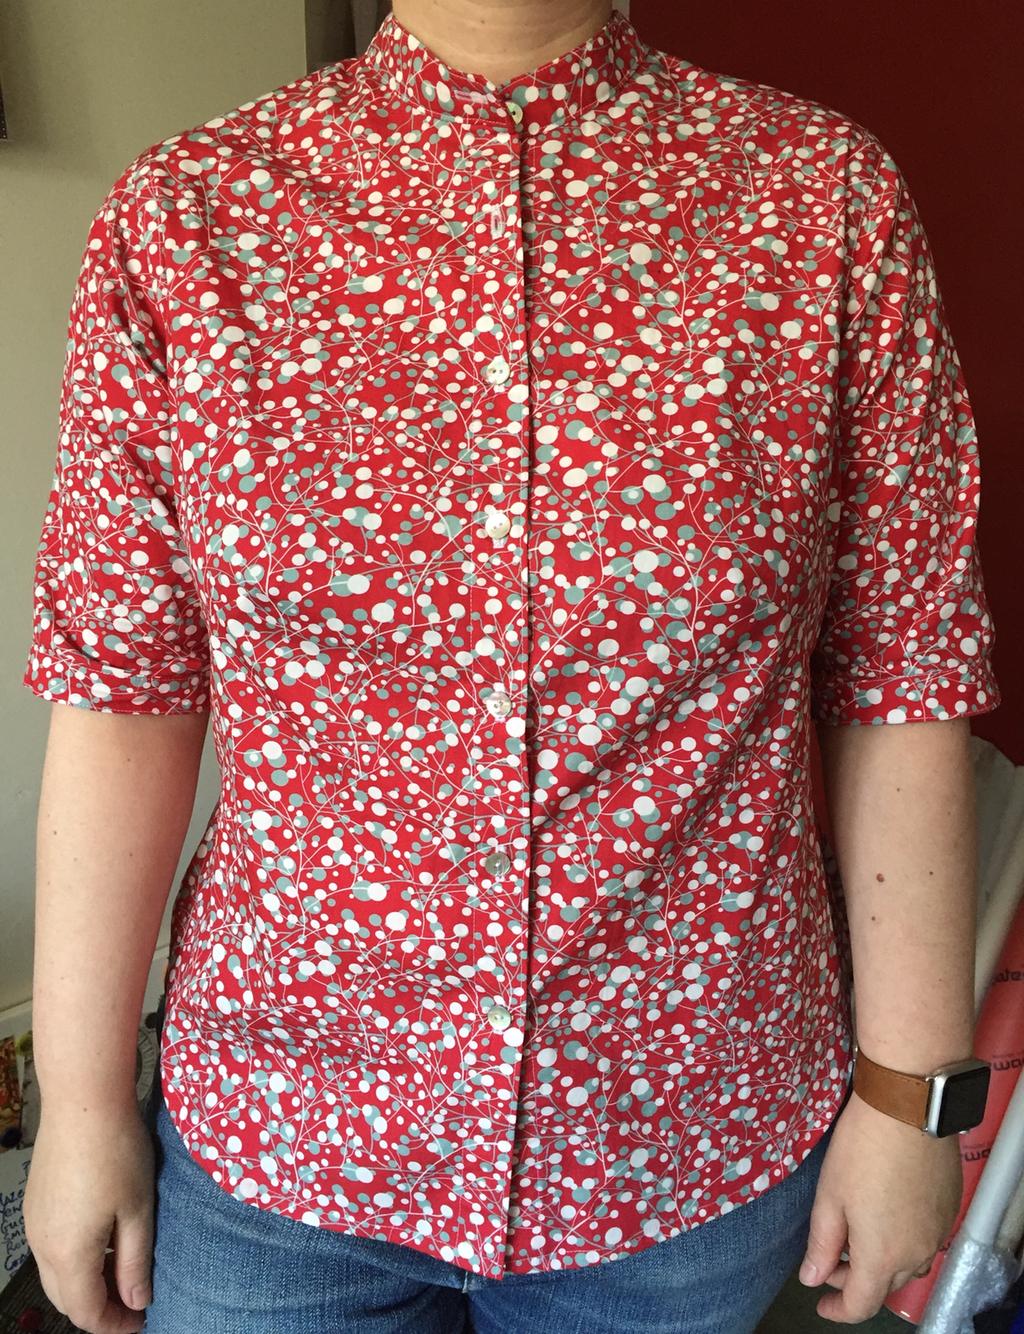 Full view of shirt as worn